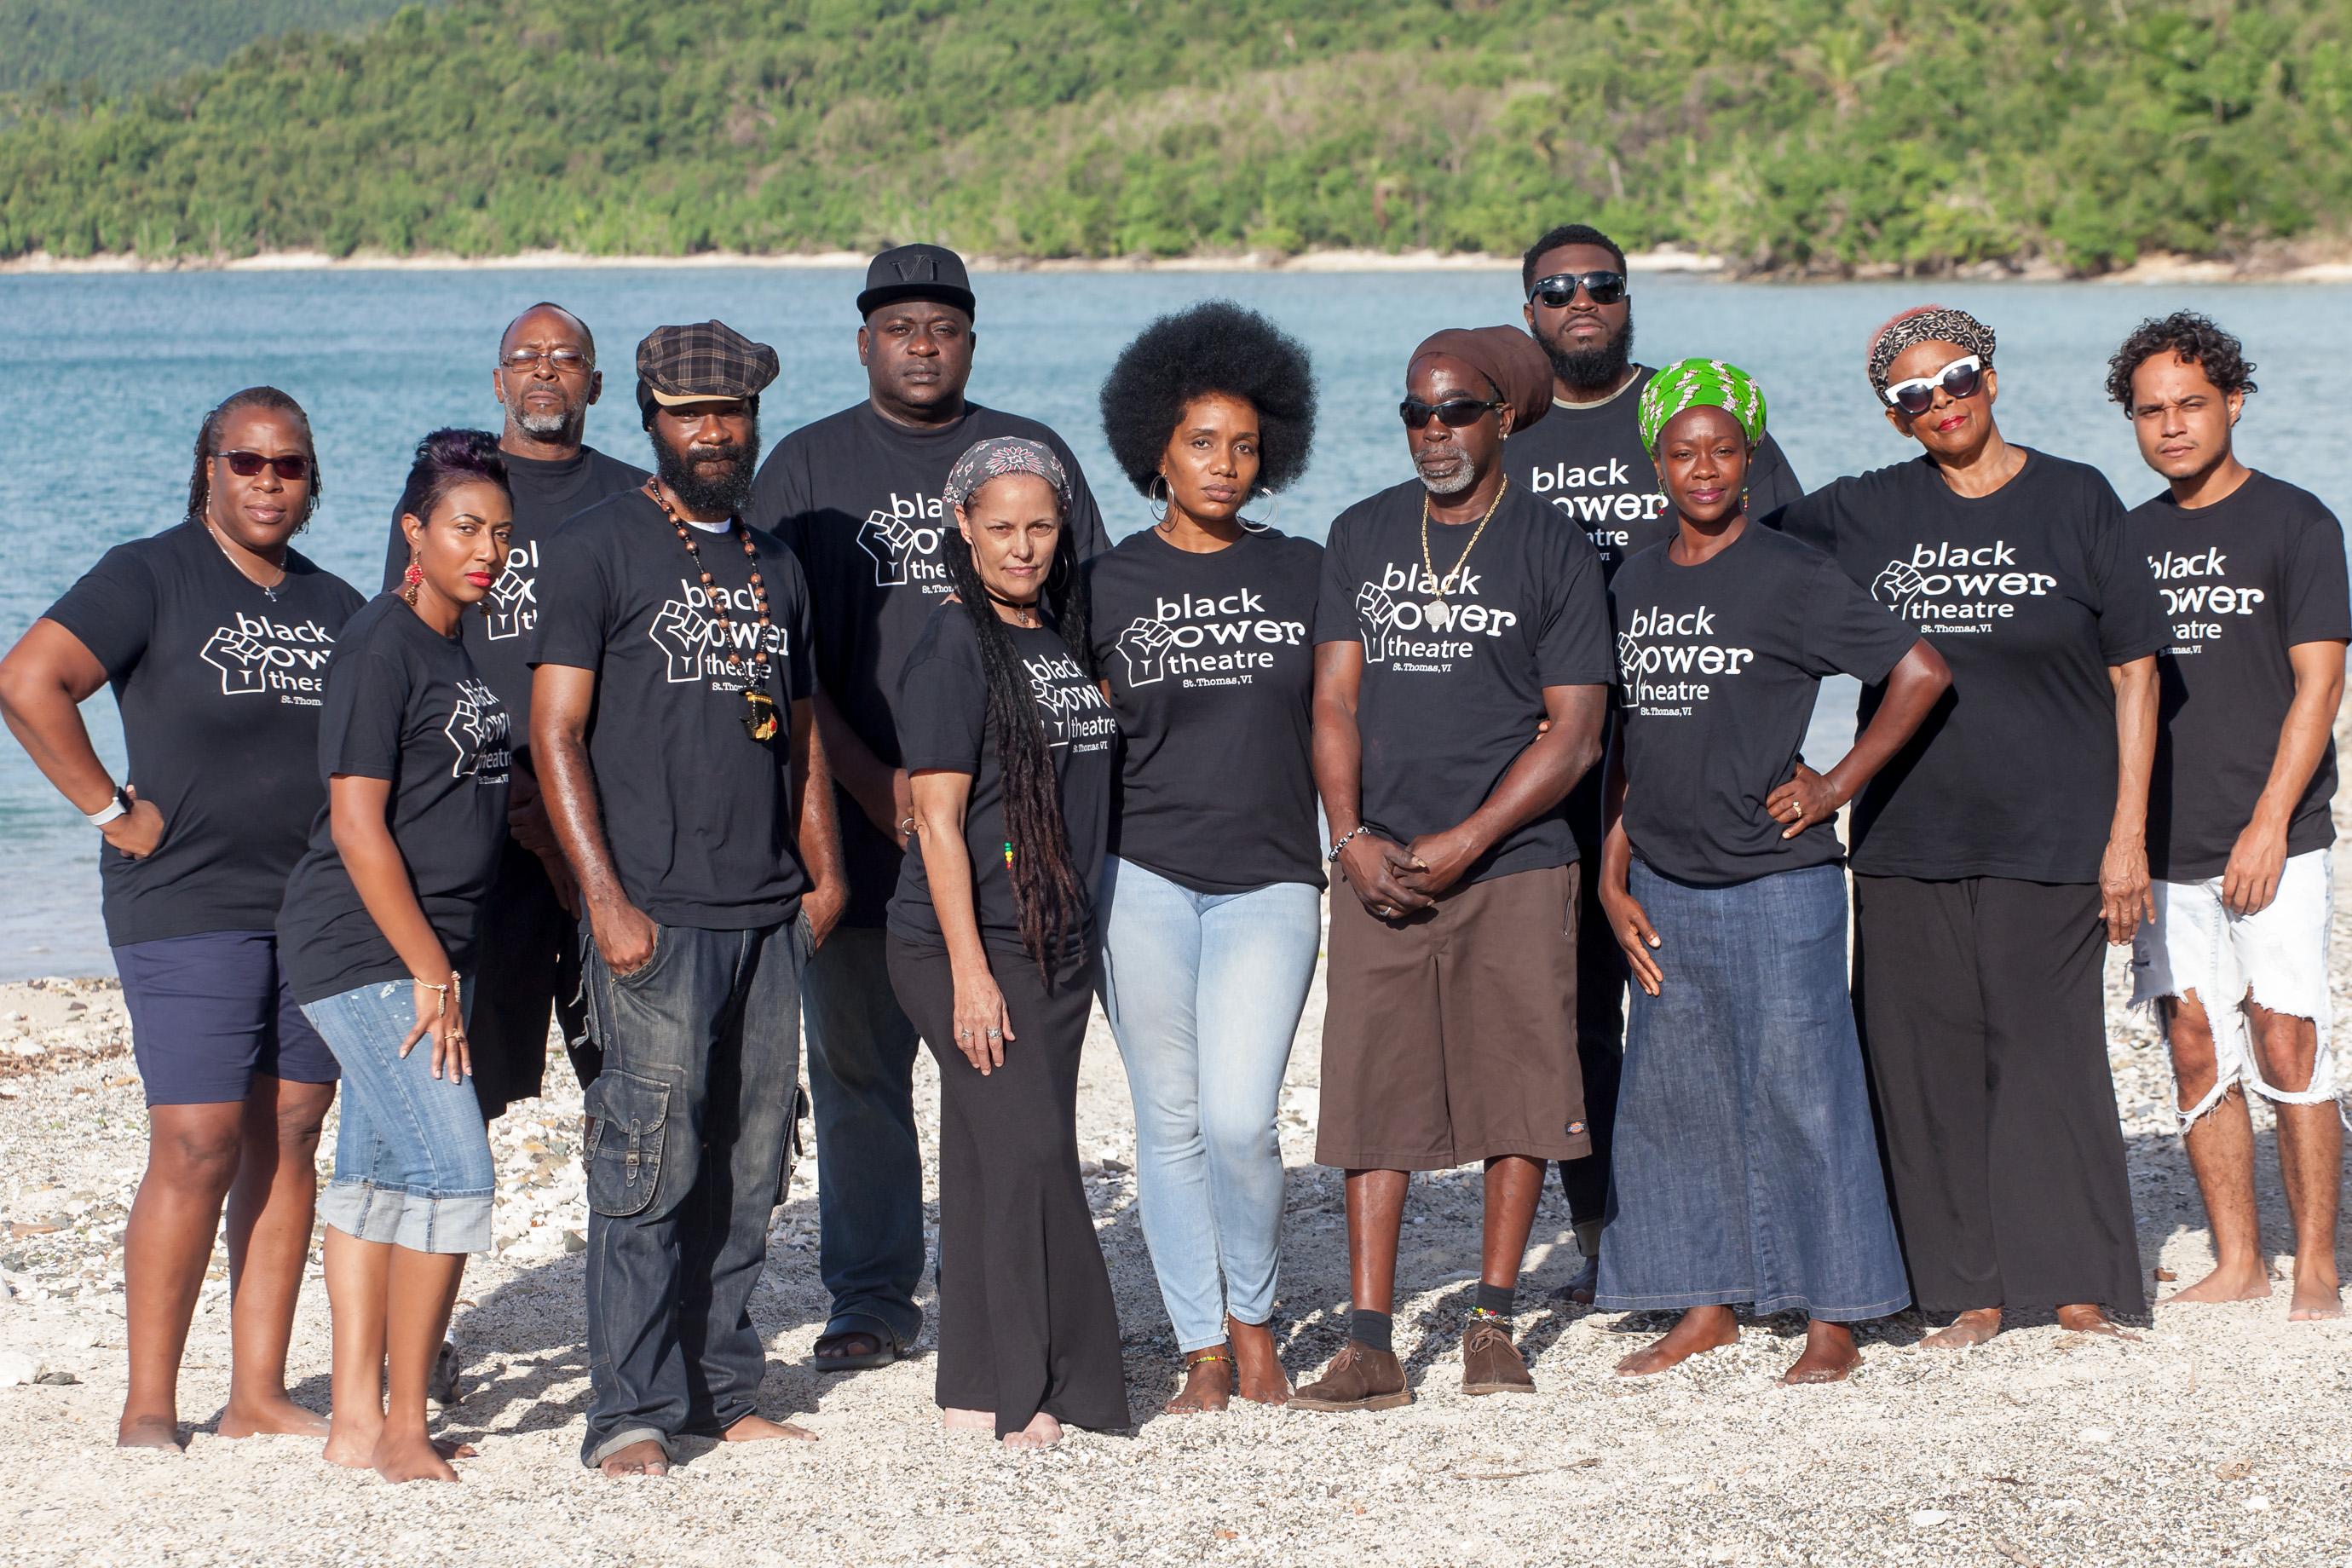 Black Power Theatre, Inc.